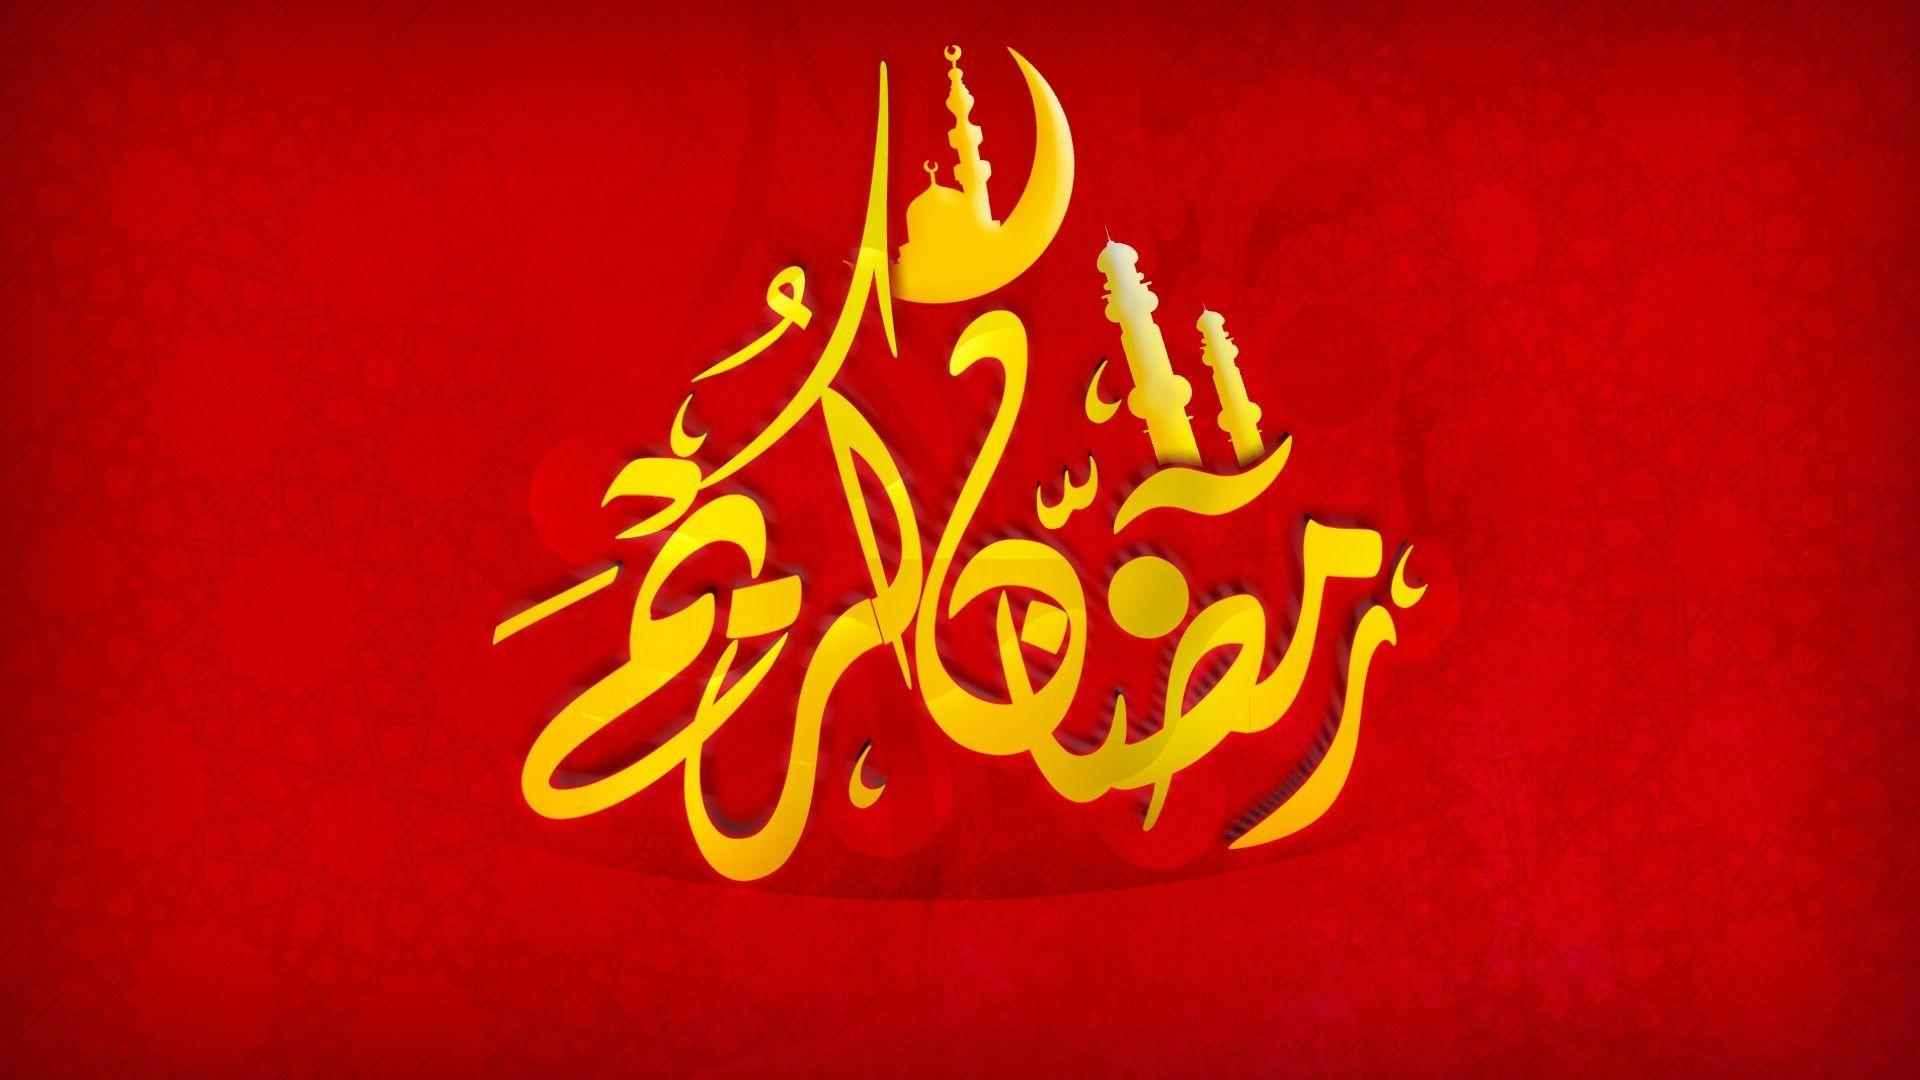 Chinese Calligraphy Wallpaper Hd Islamic Wallpapers Hd 2018 183 ① Wallpapertag